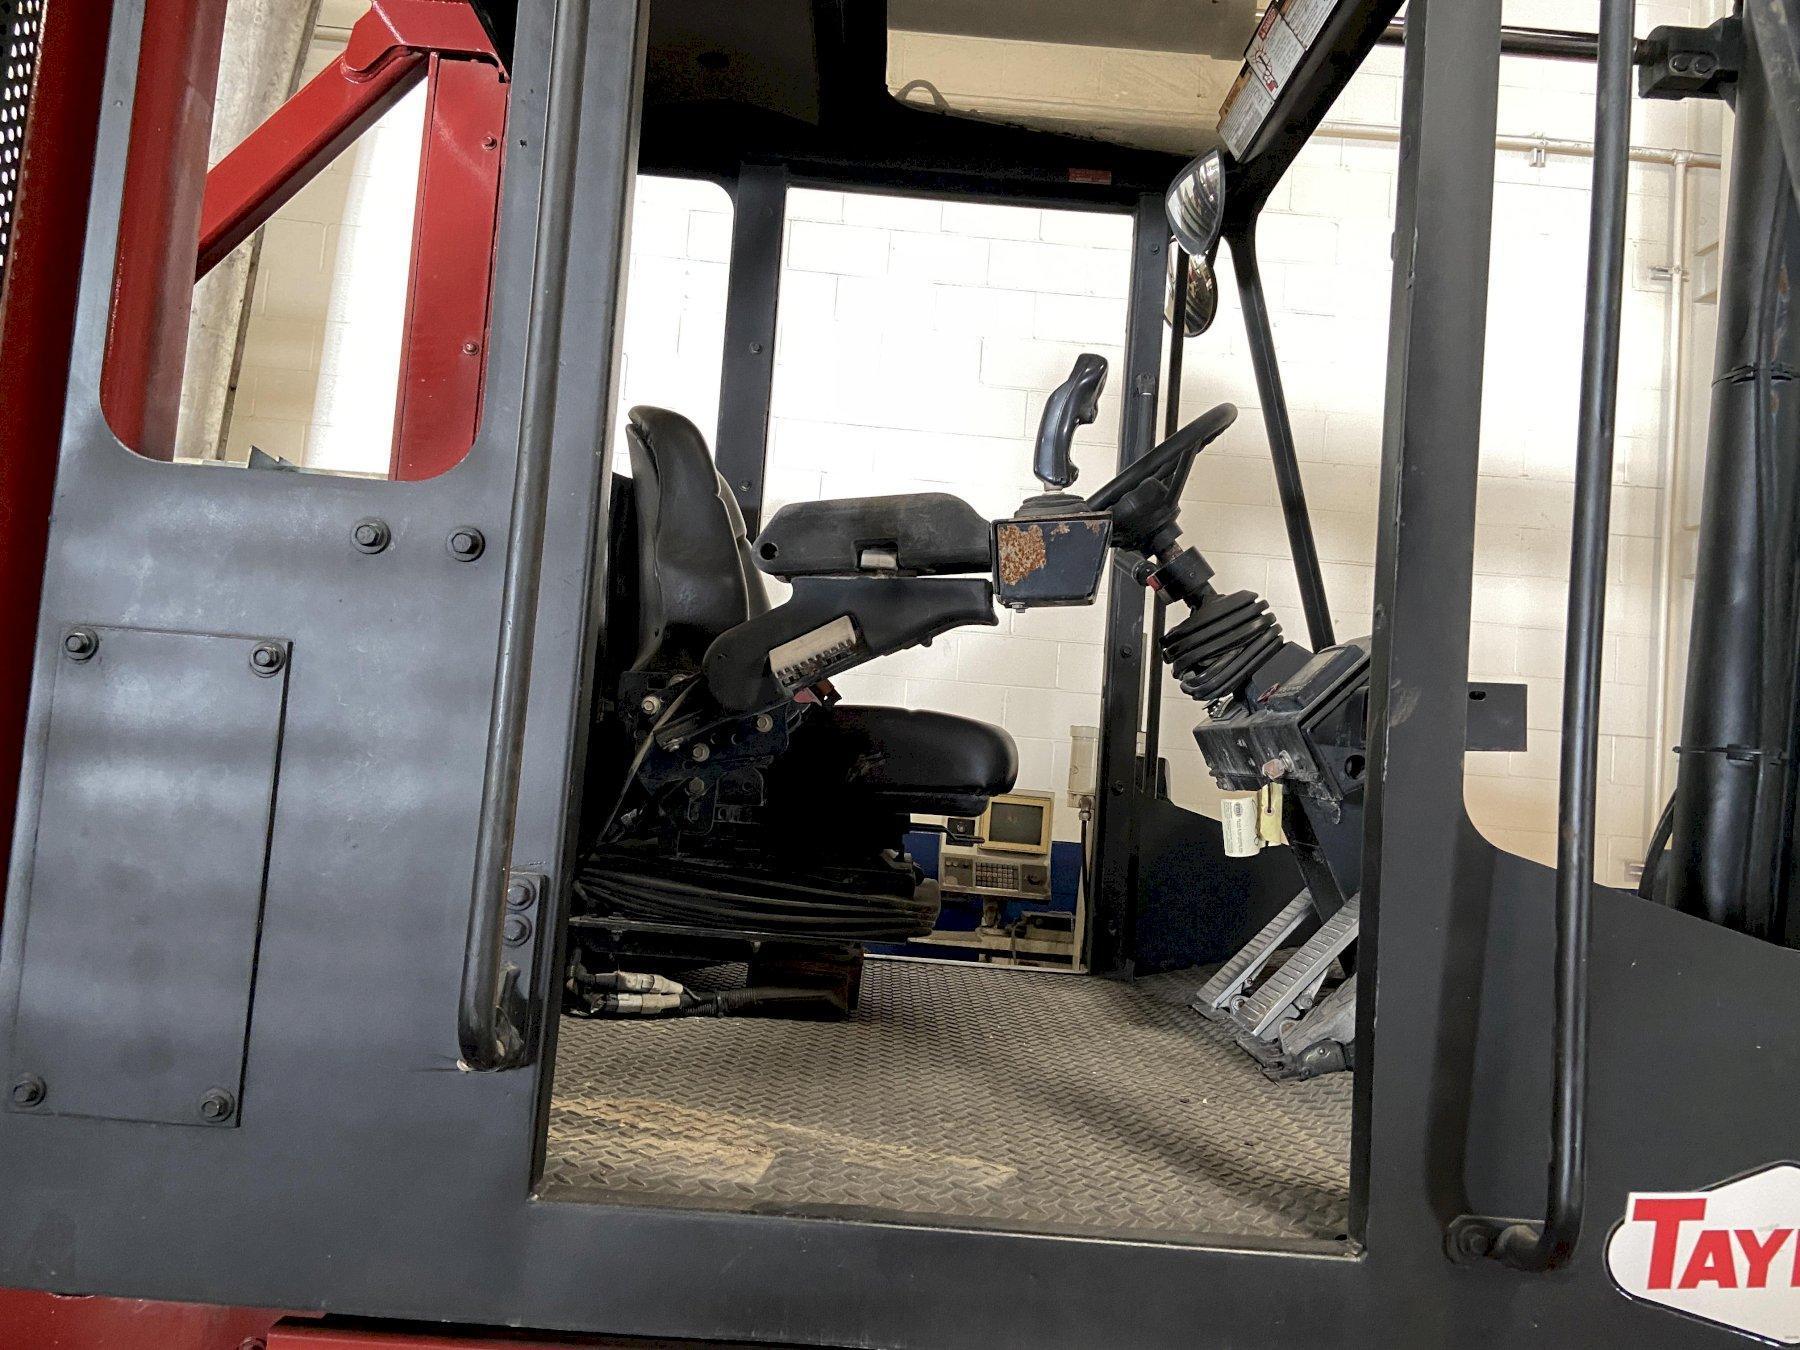 "Taylor TX-360L (Big Red) 36,000 LB Forklift, 135"" Lift Height, 15/12 Lift Angle, Cummins Diesel"